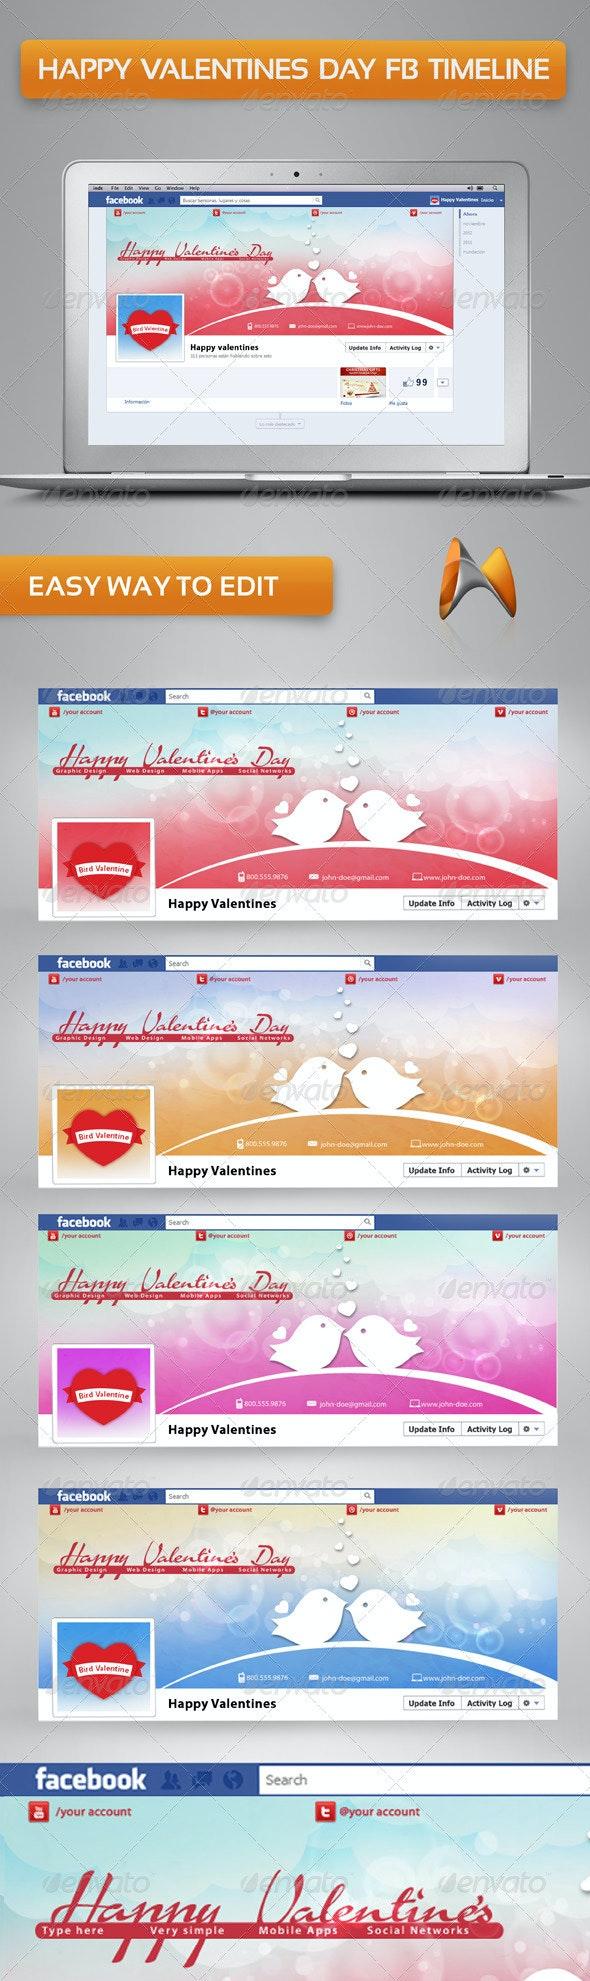 Happy Valentine's Day Timeline Cover - Facebook Timeline Covers Social Media